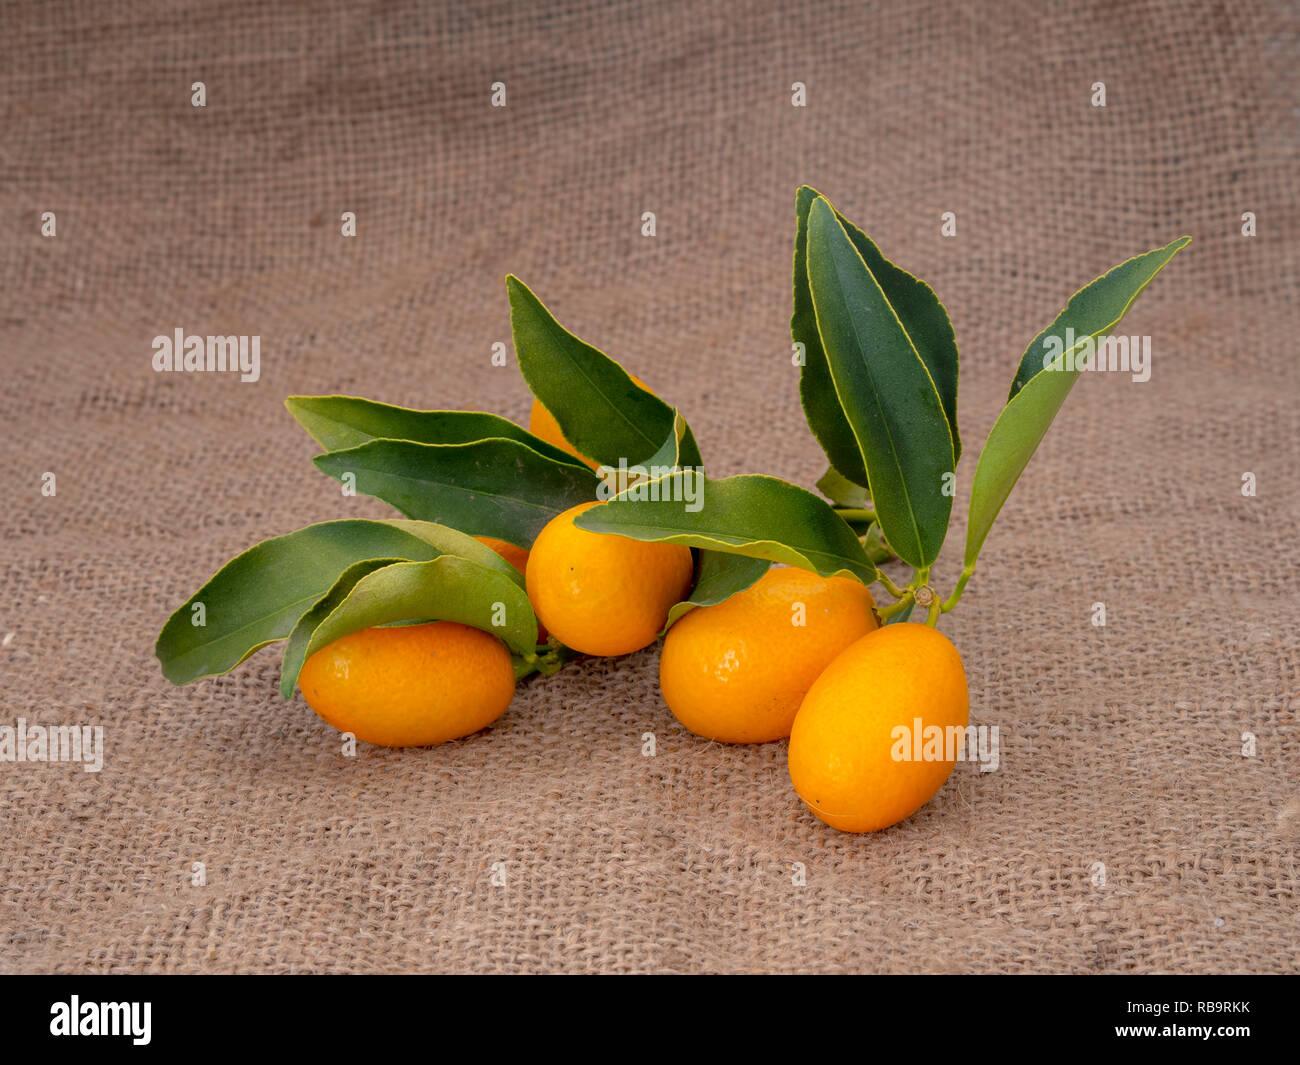 Kumquat, cumquat citrus fruits on hessian, with leaves. Fresh picked. - Stock Image